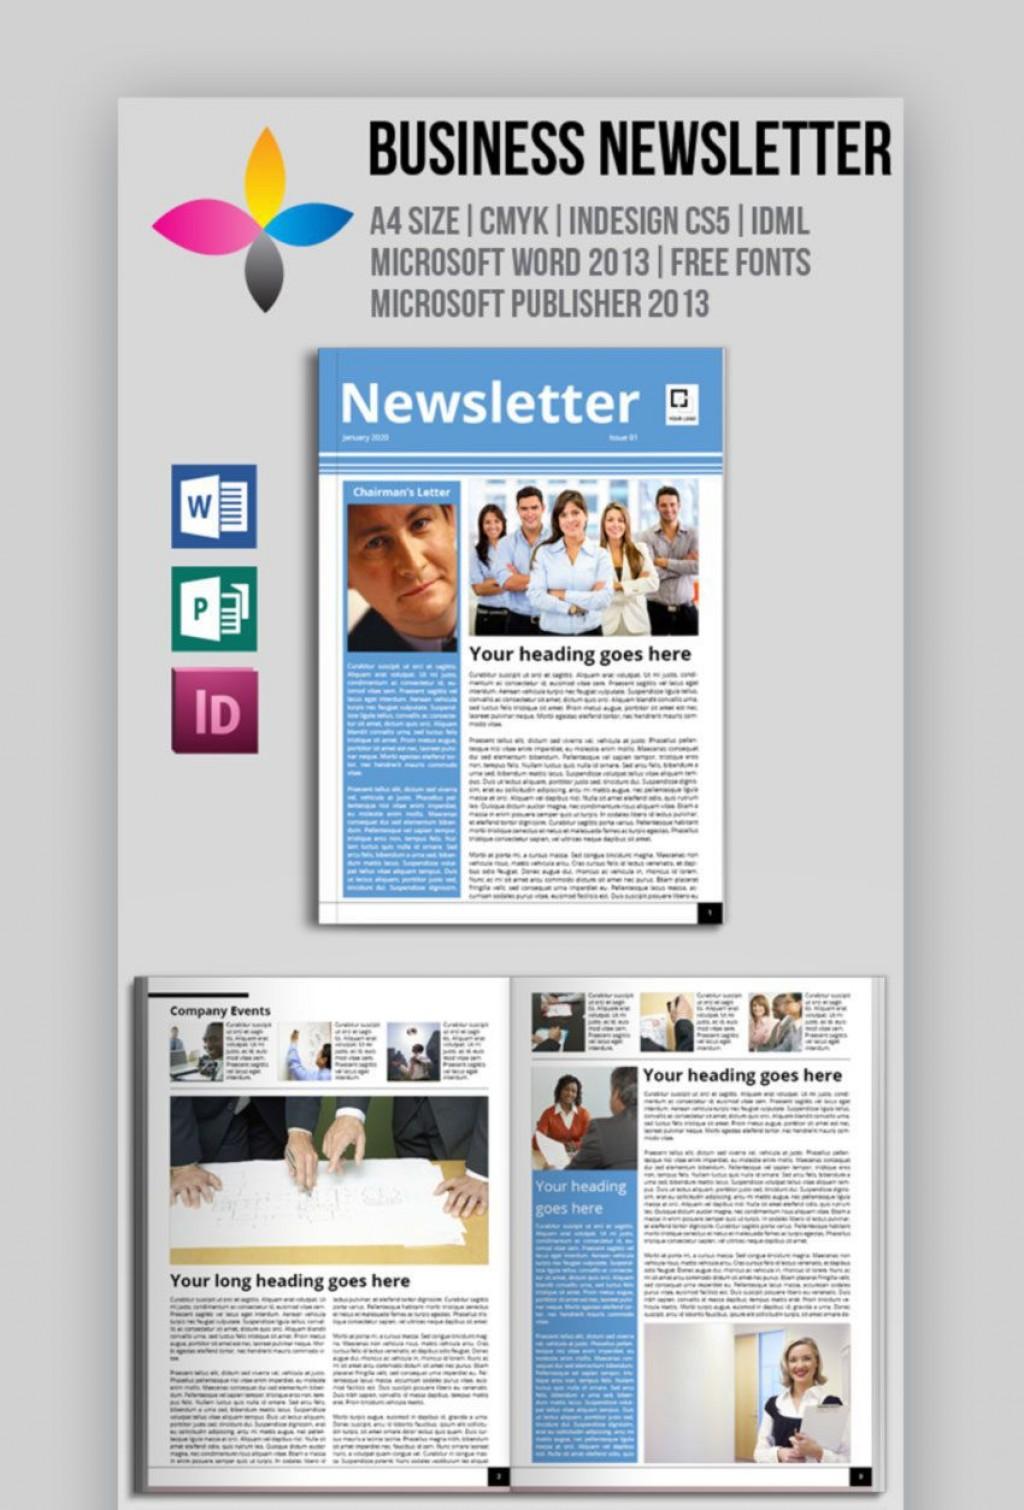 009 Impressive Word Newsletter Template Free Download Design  Document M 2007Large